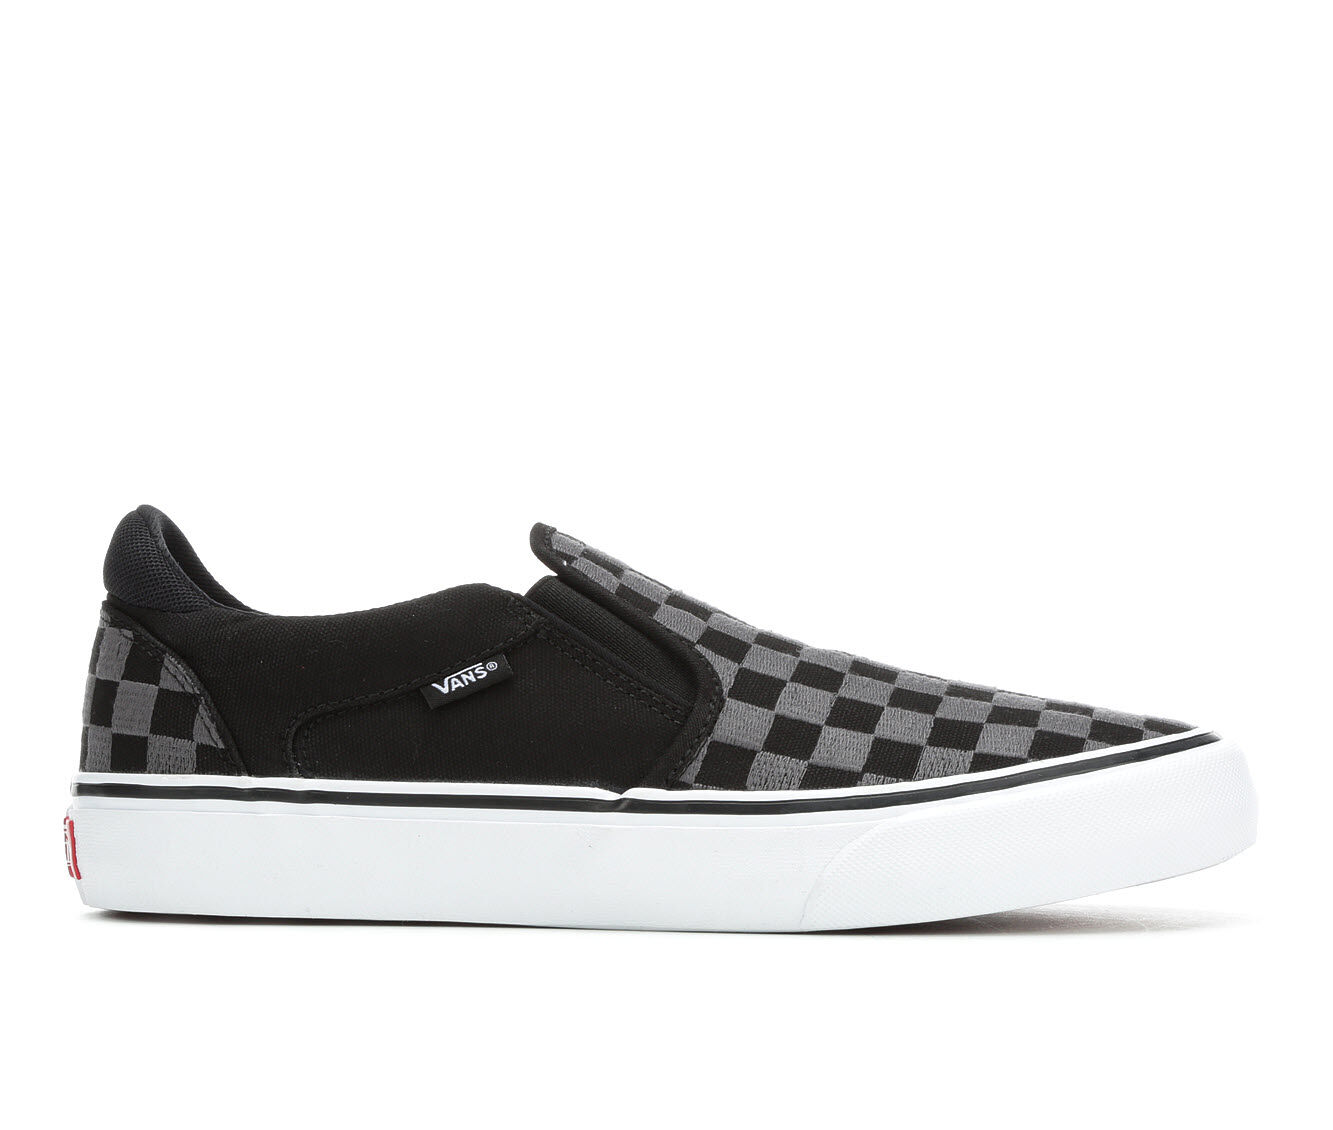 Men's Vans Asher-Deluxe Skate Shoes Blk/Grey Check